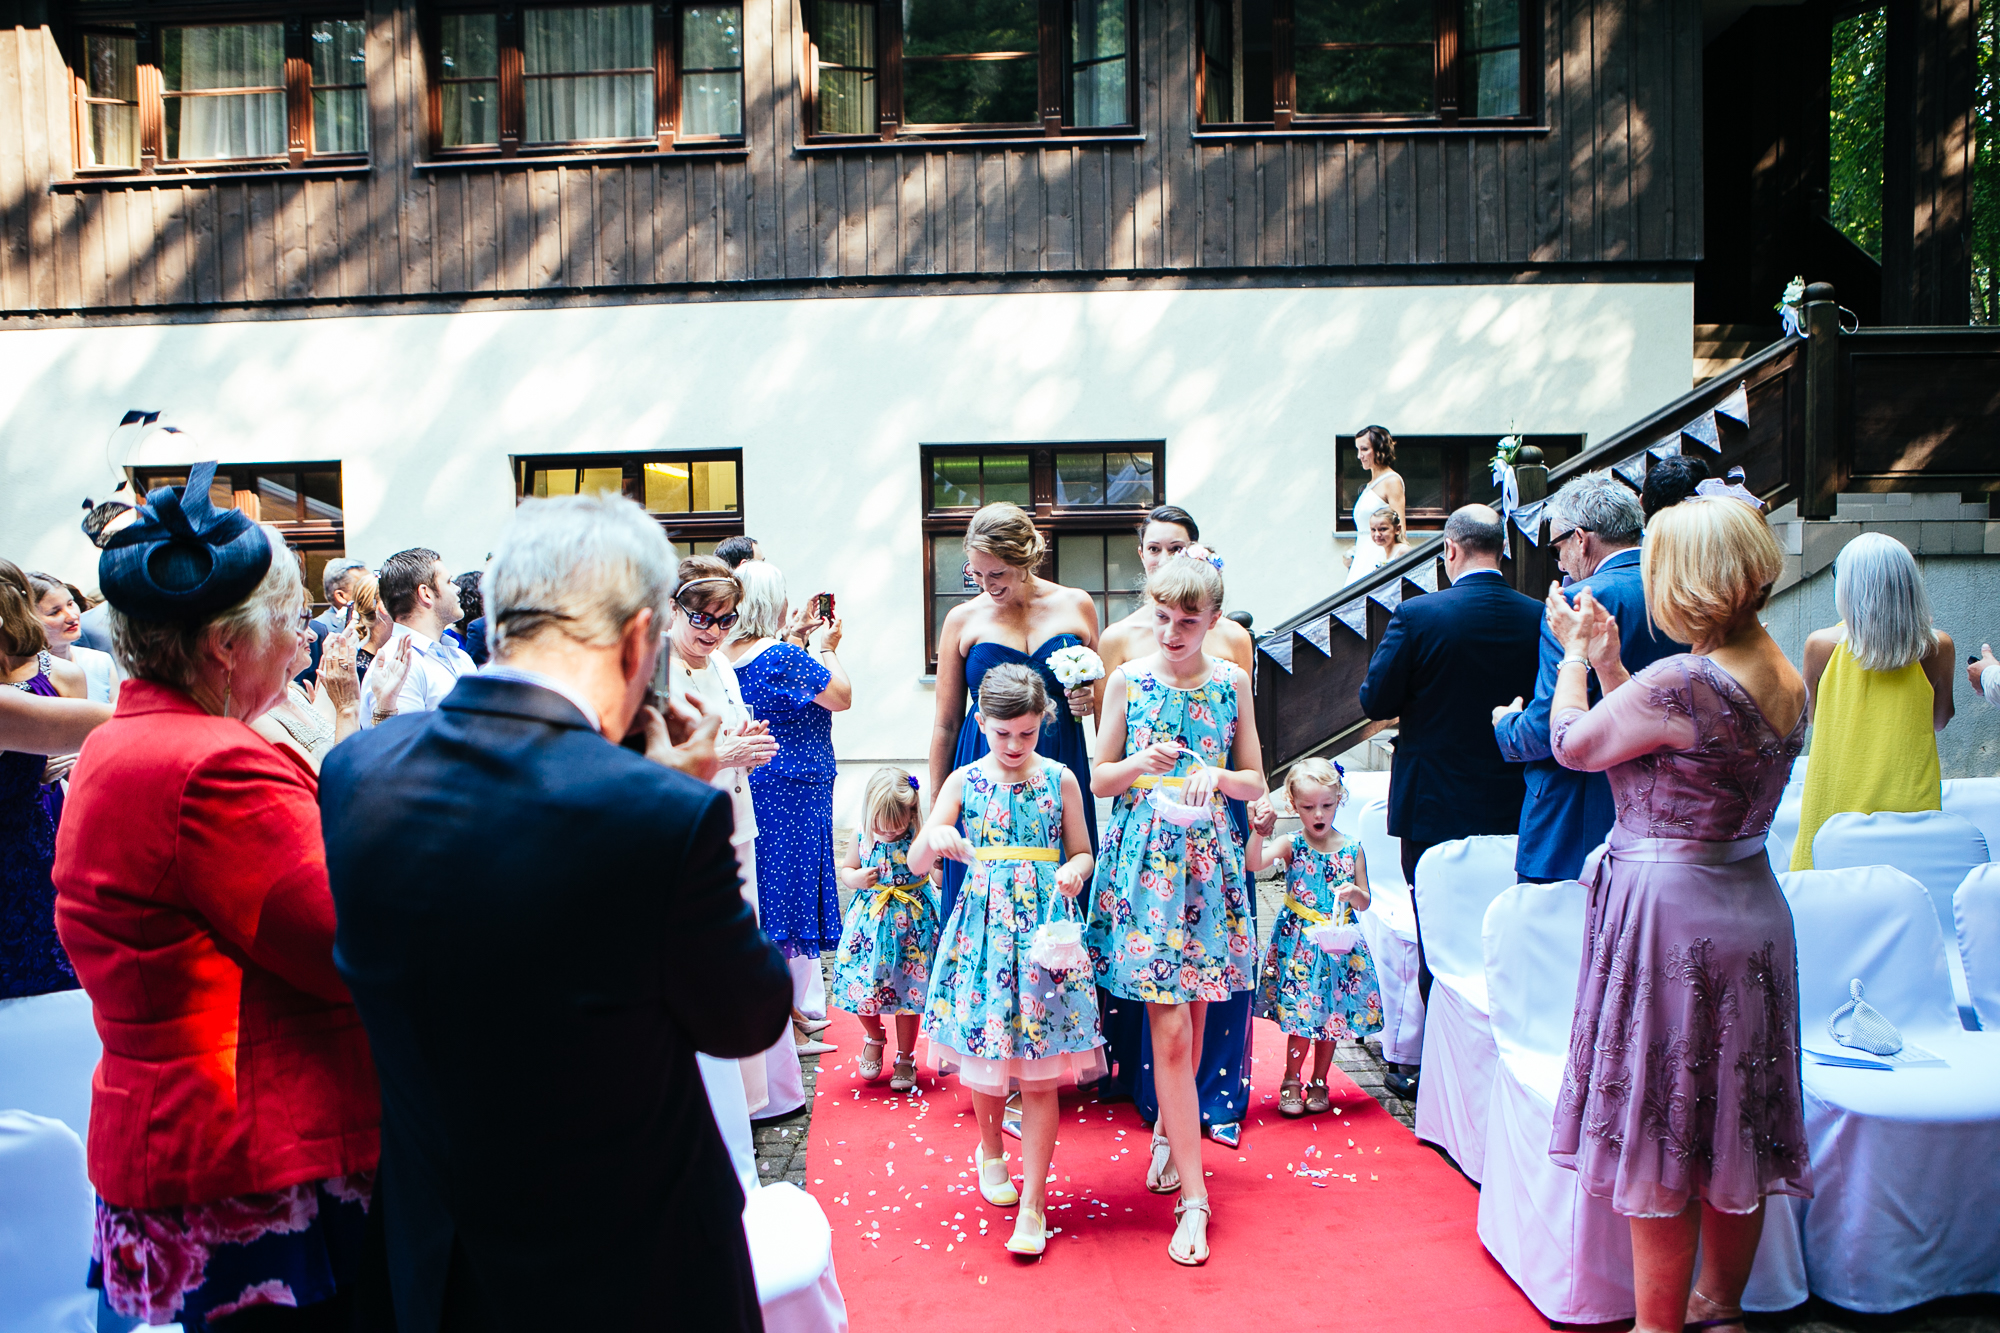 outdoor wedding ceremony procession destination wedding photography poland hotel opera